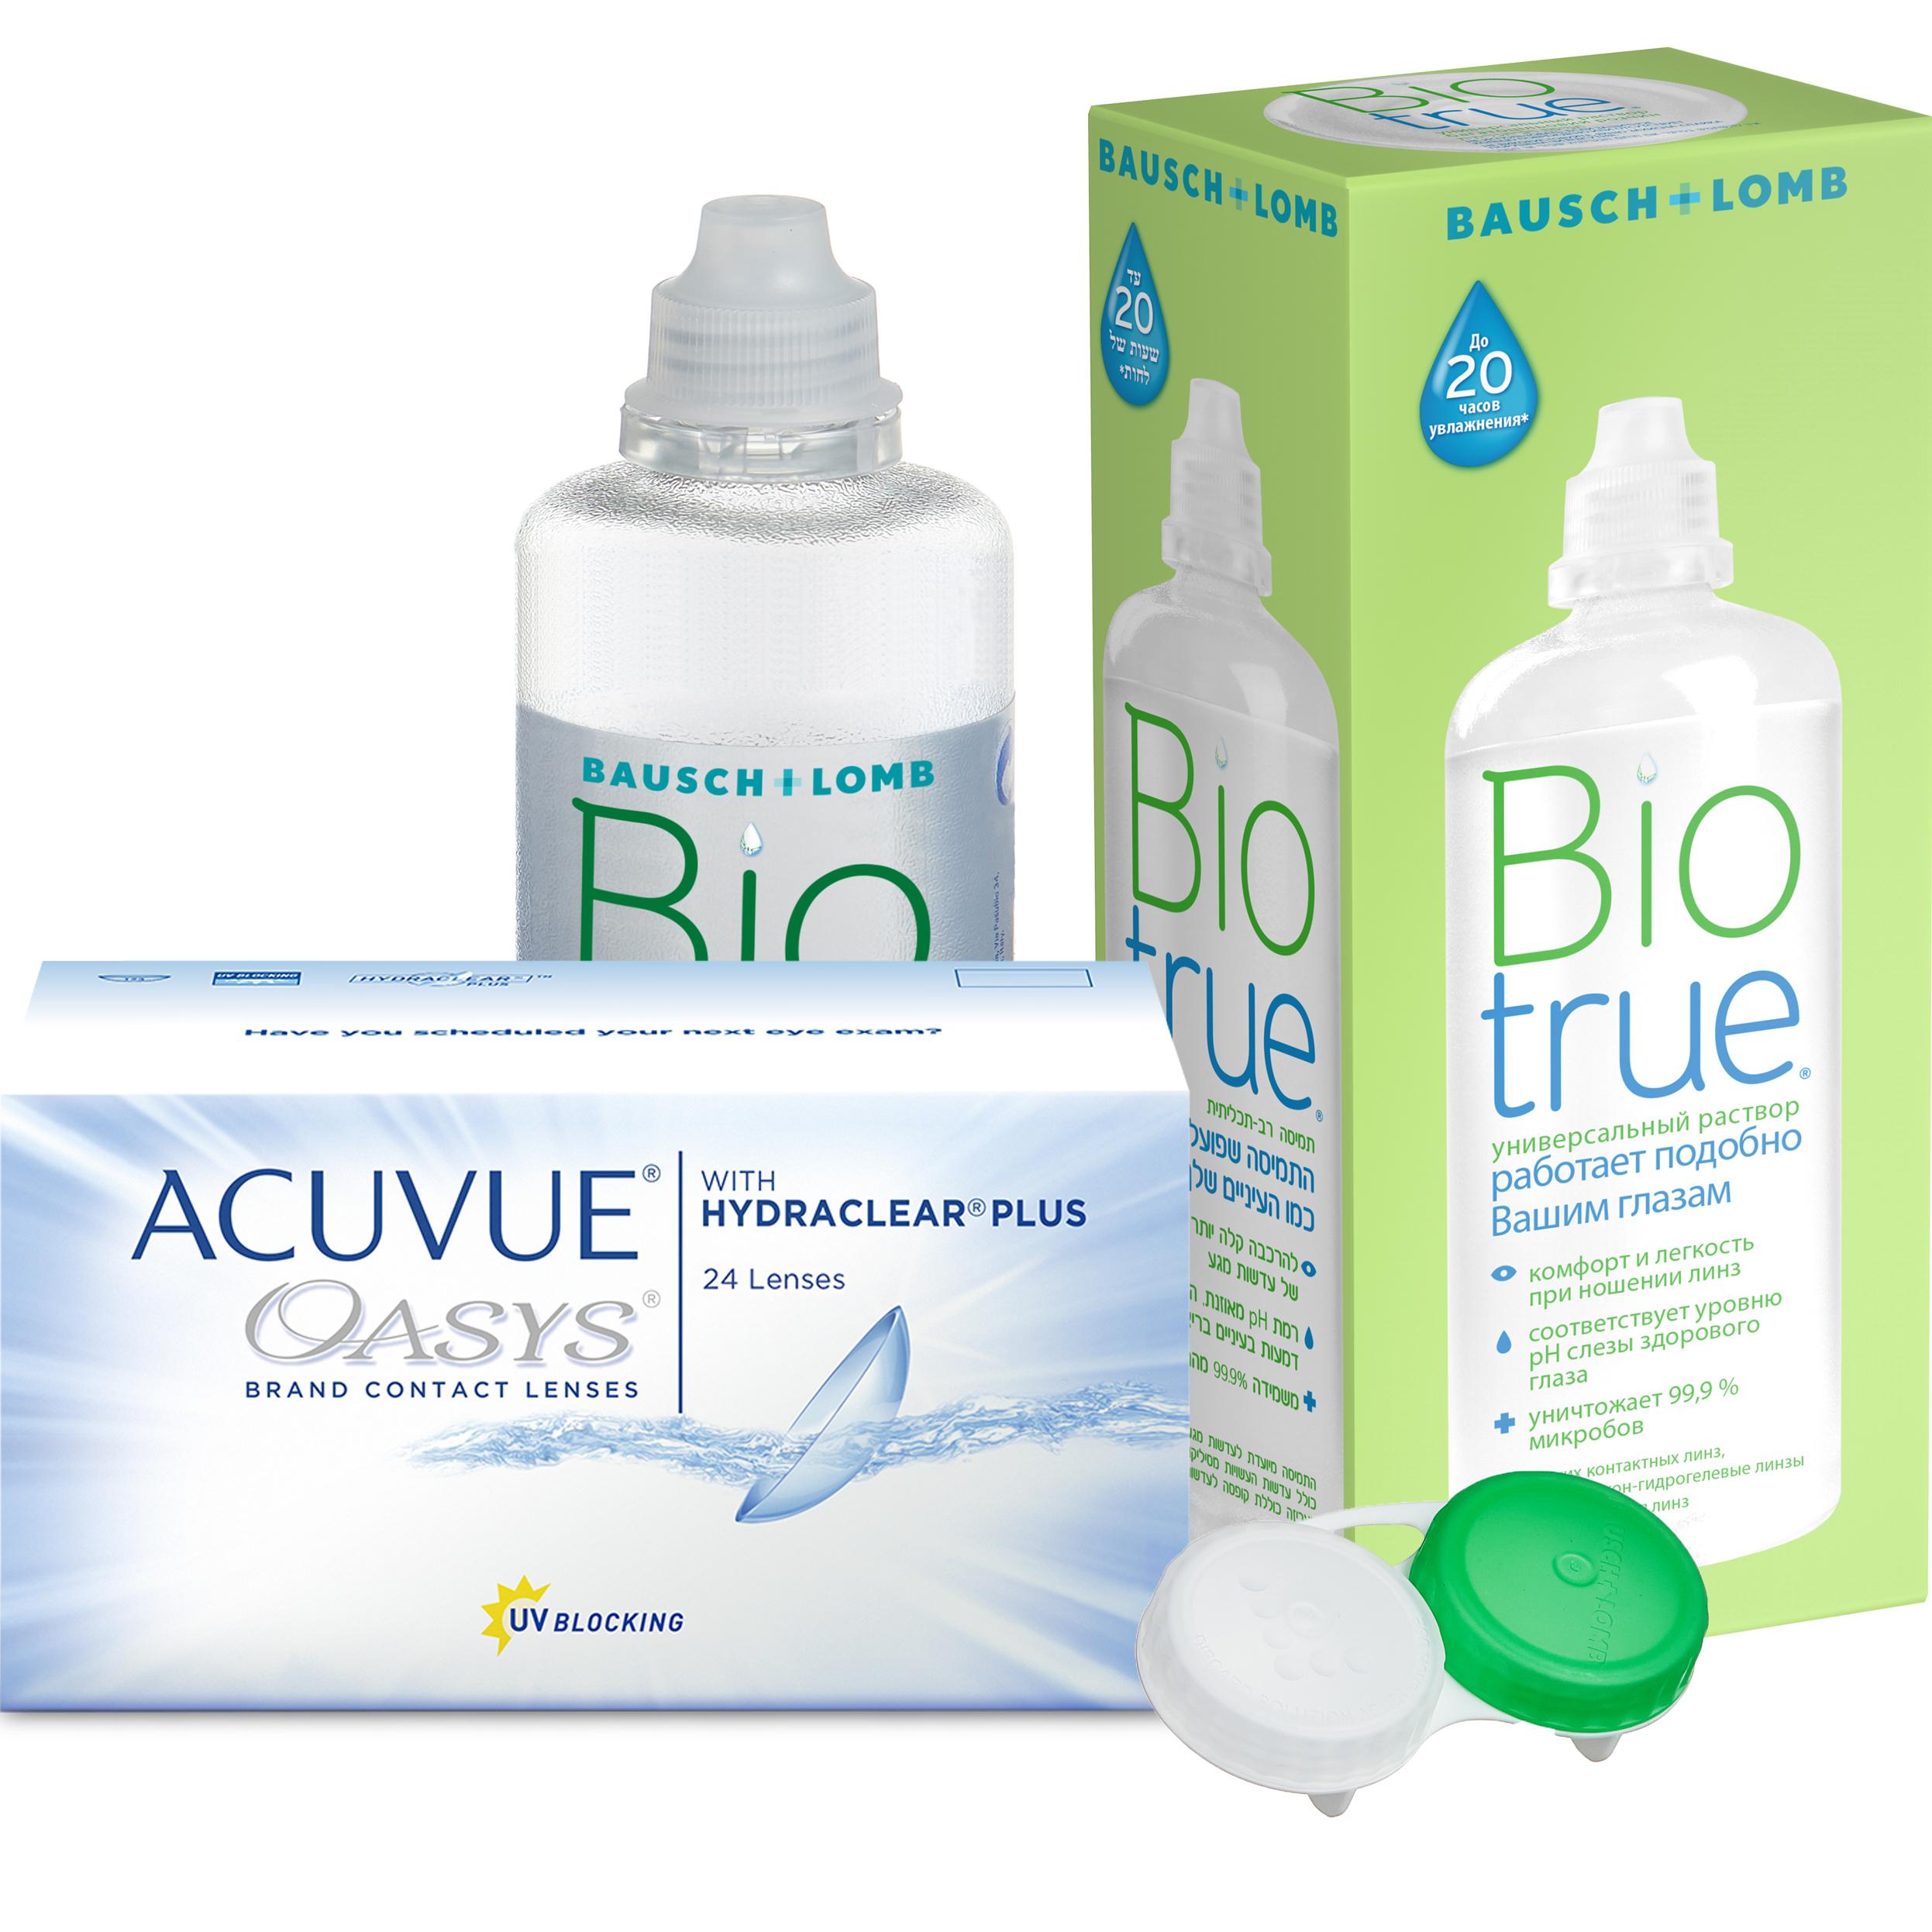 Купить Oasys with Hydraclear Plus 24 линзы + Biotrue, Контактные линзы Acuvue Oasys with Hydraclear Plus 24 линзы R 8.8 +2, 75 + Biotrue 300 мл